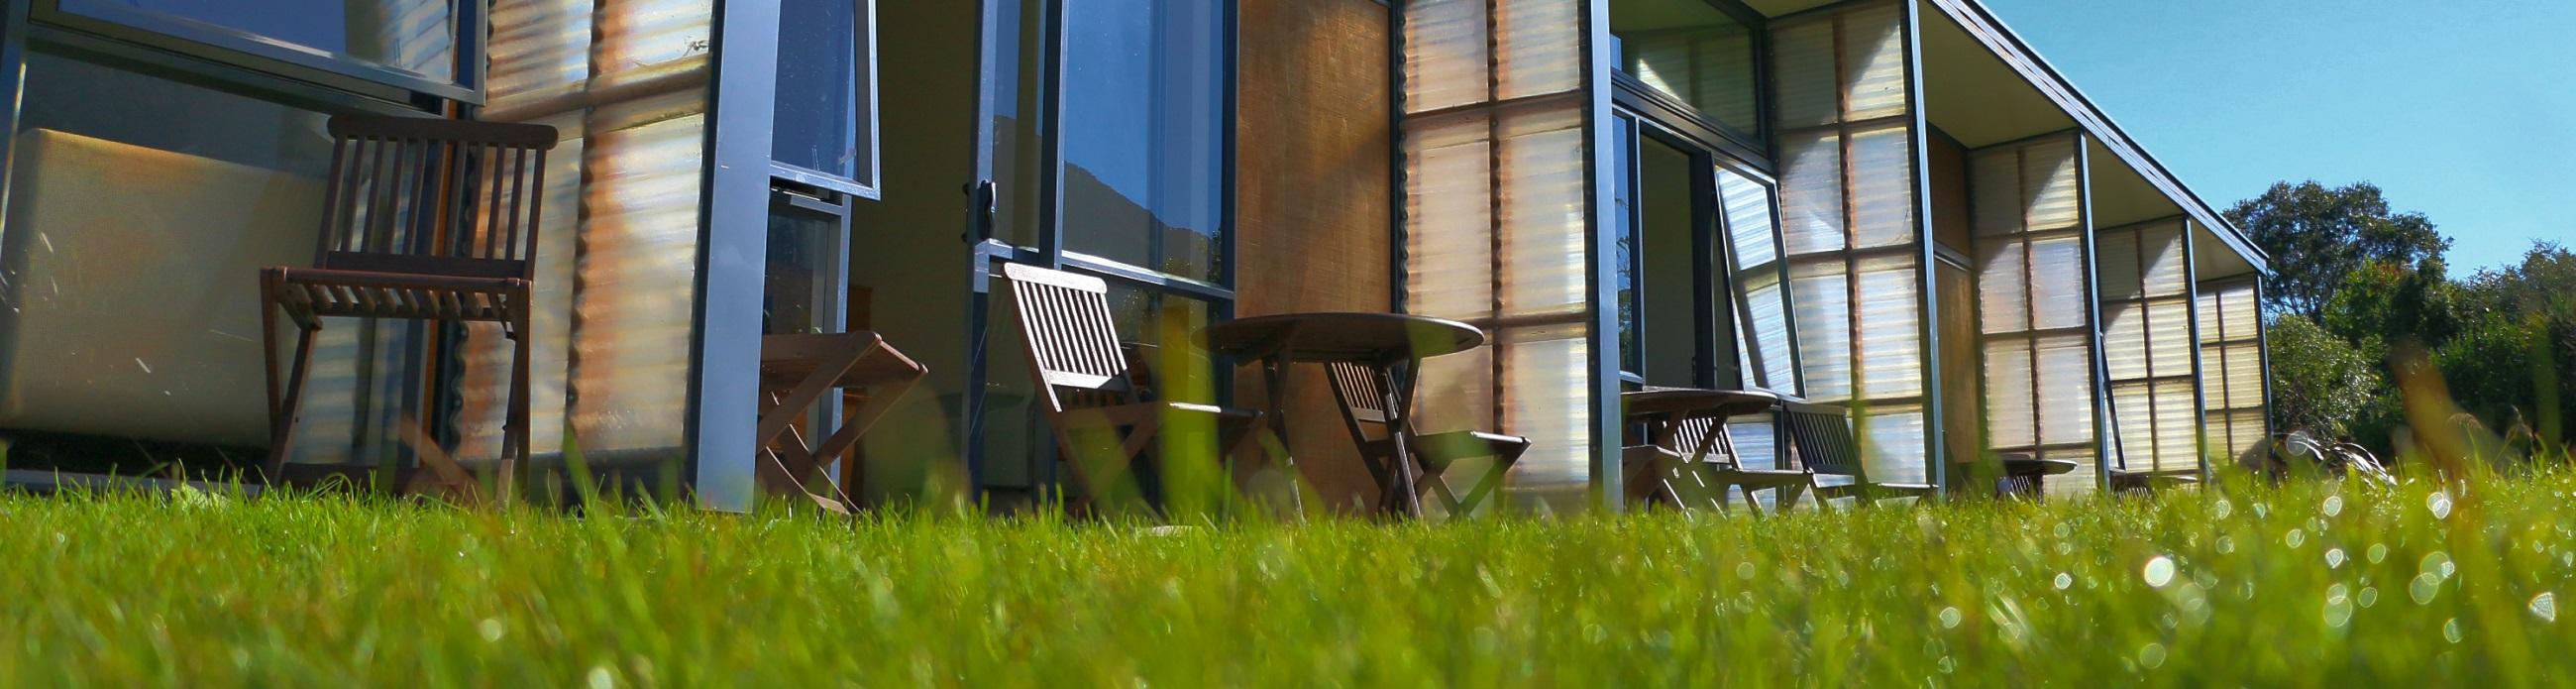 golden chain accommodation ezibed nz. Black Bedroom Furniture Sets. Home Design Ideas